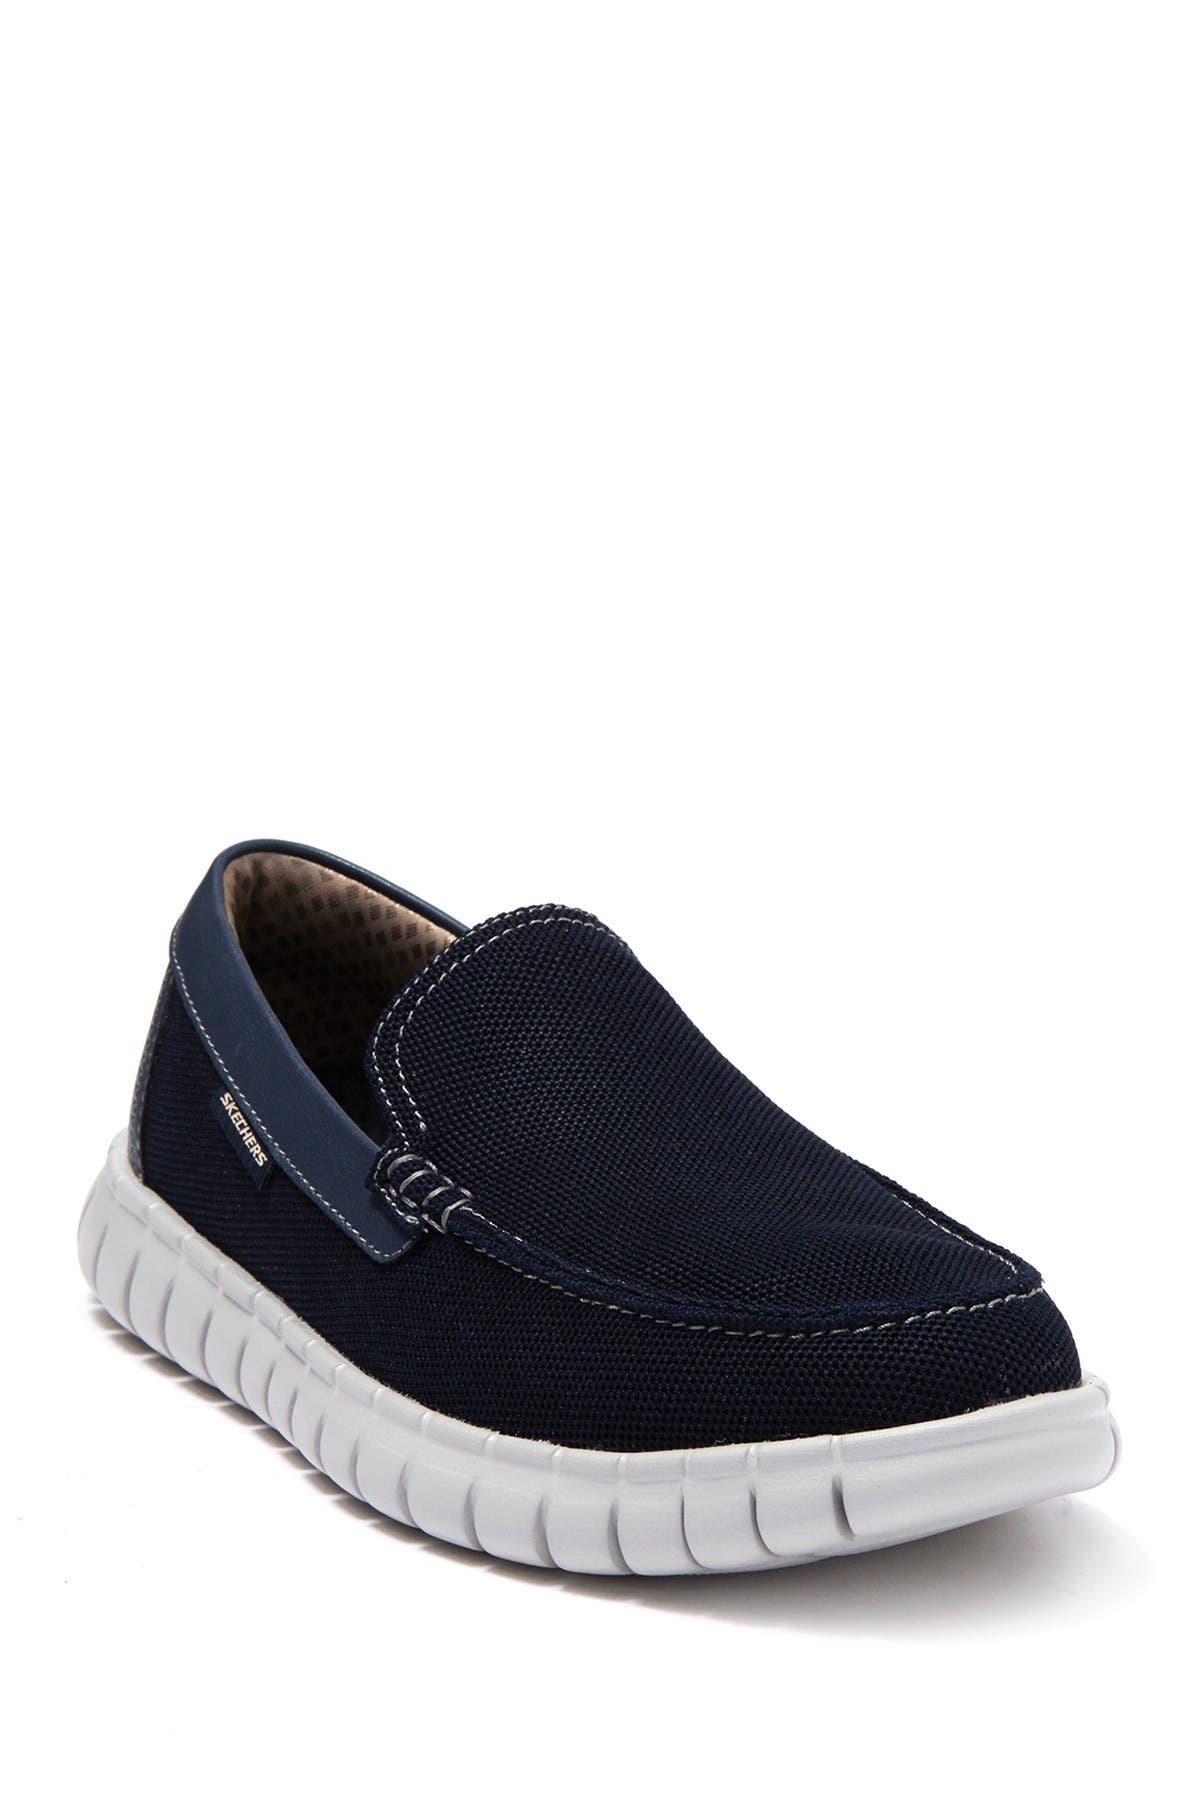 Image of Skechers Moreway Chapson Slip-On Shoe